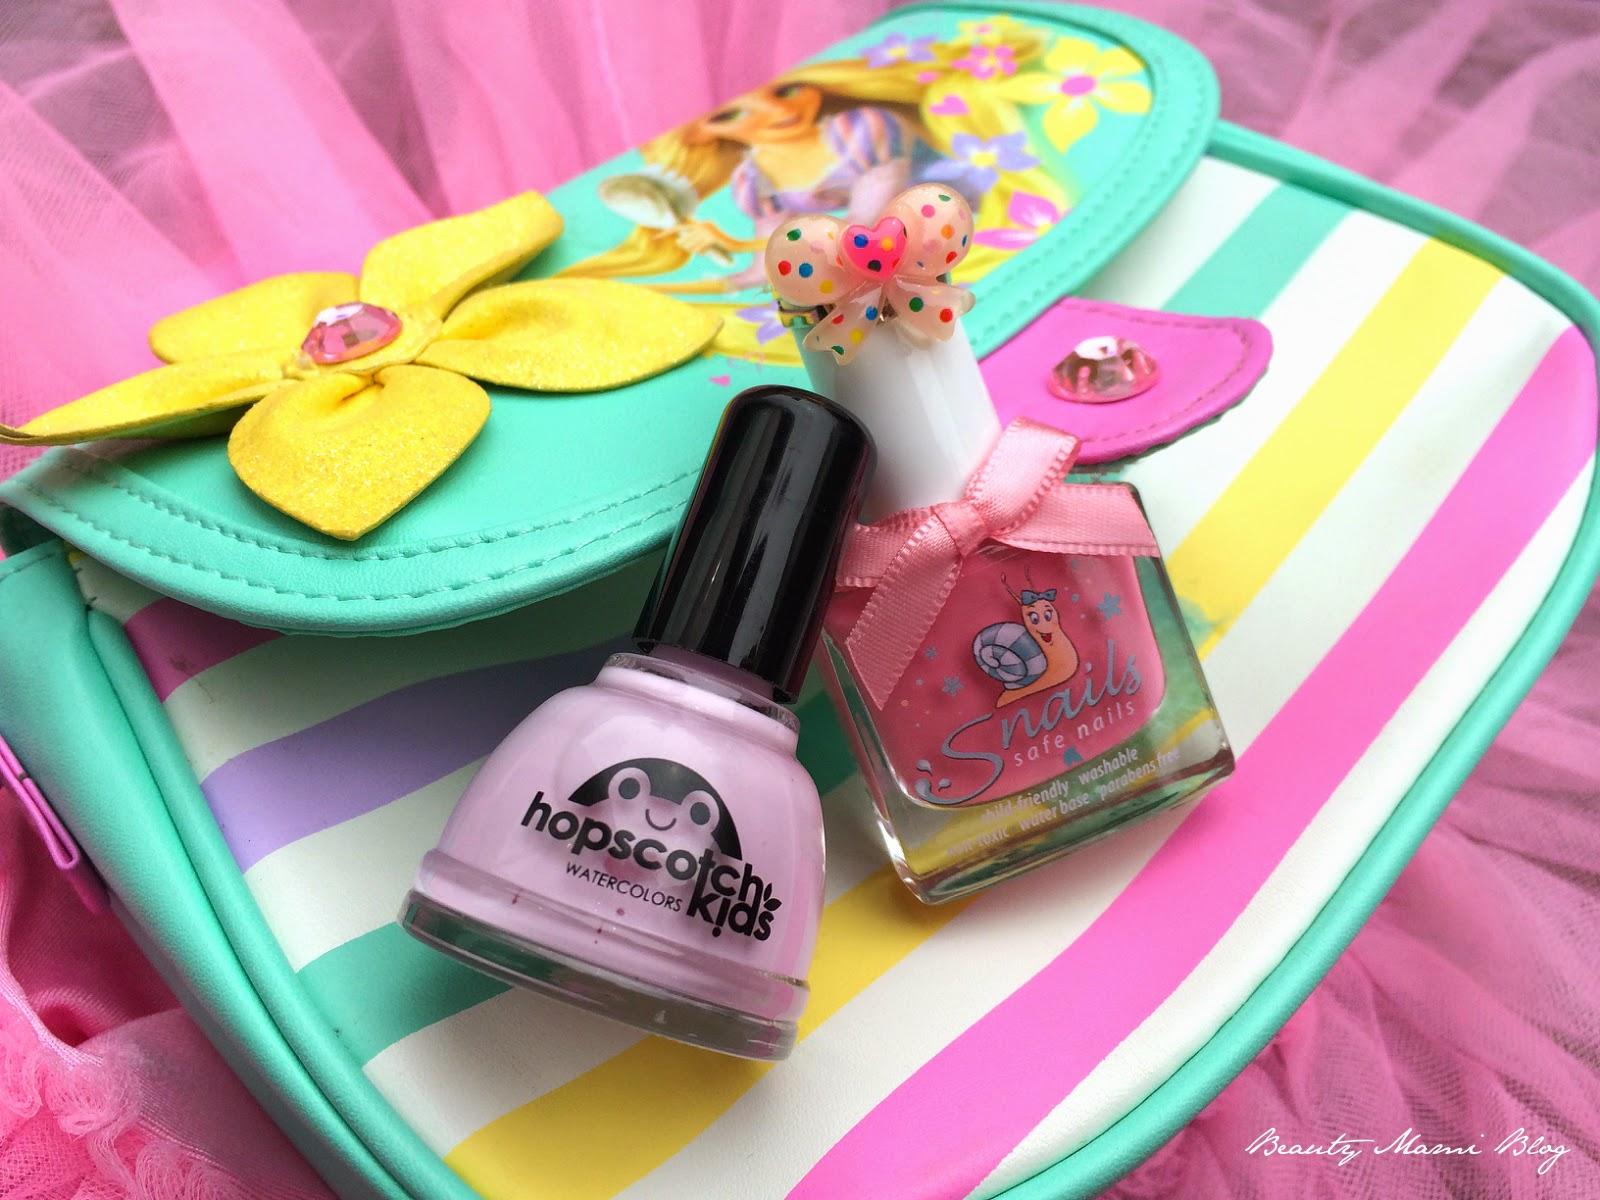 Nagellacke extra für Kinder • Beauty Mami